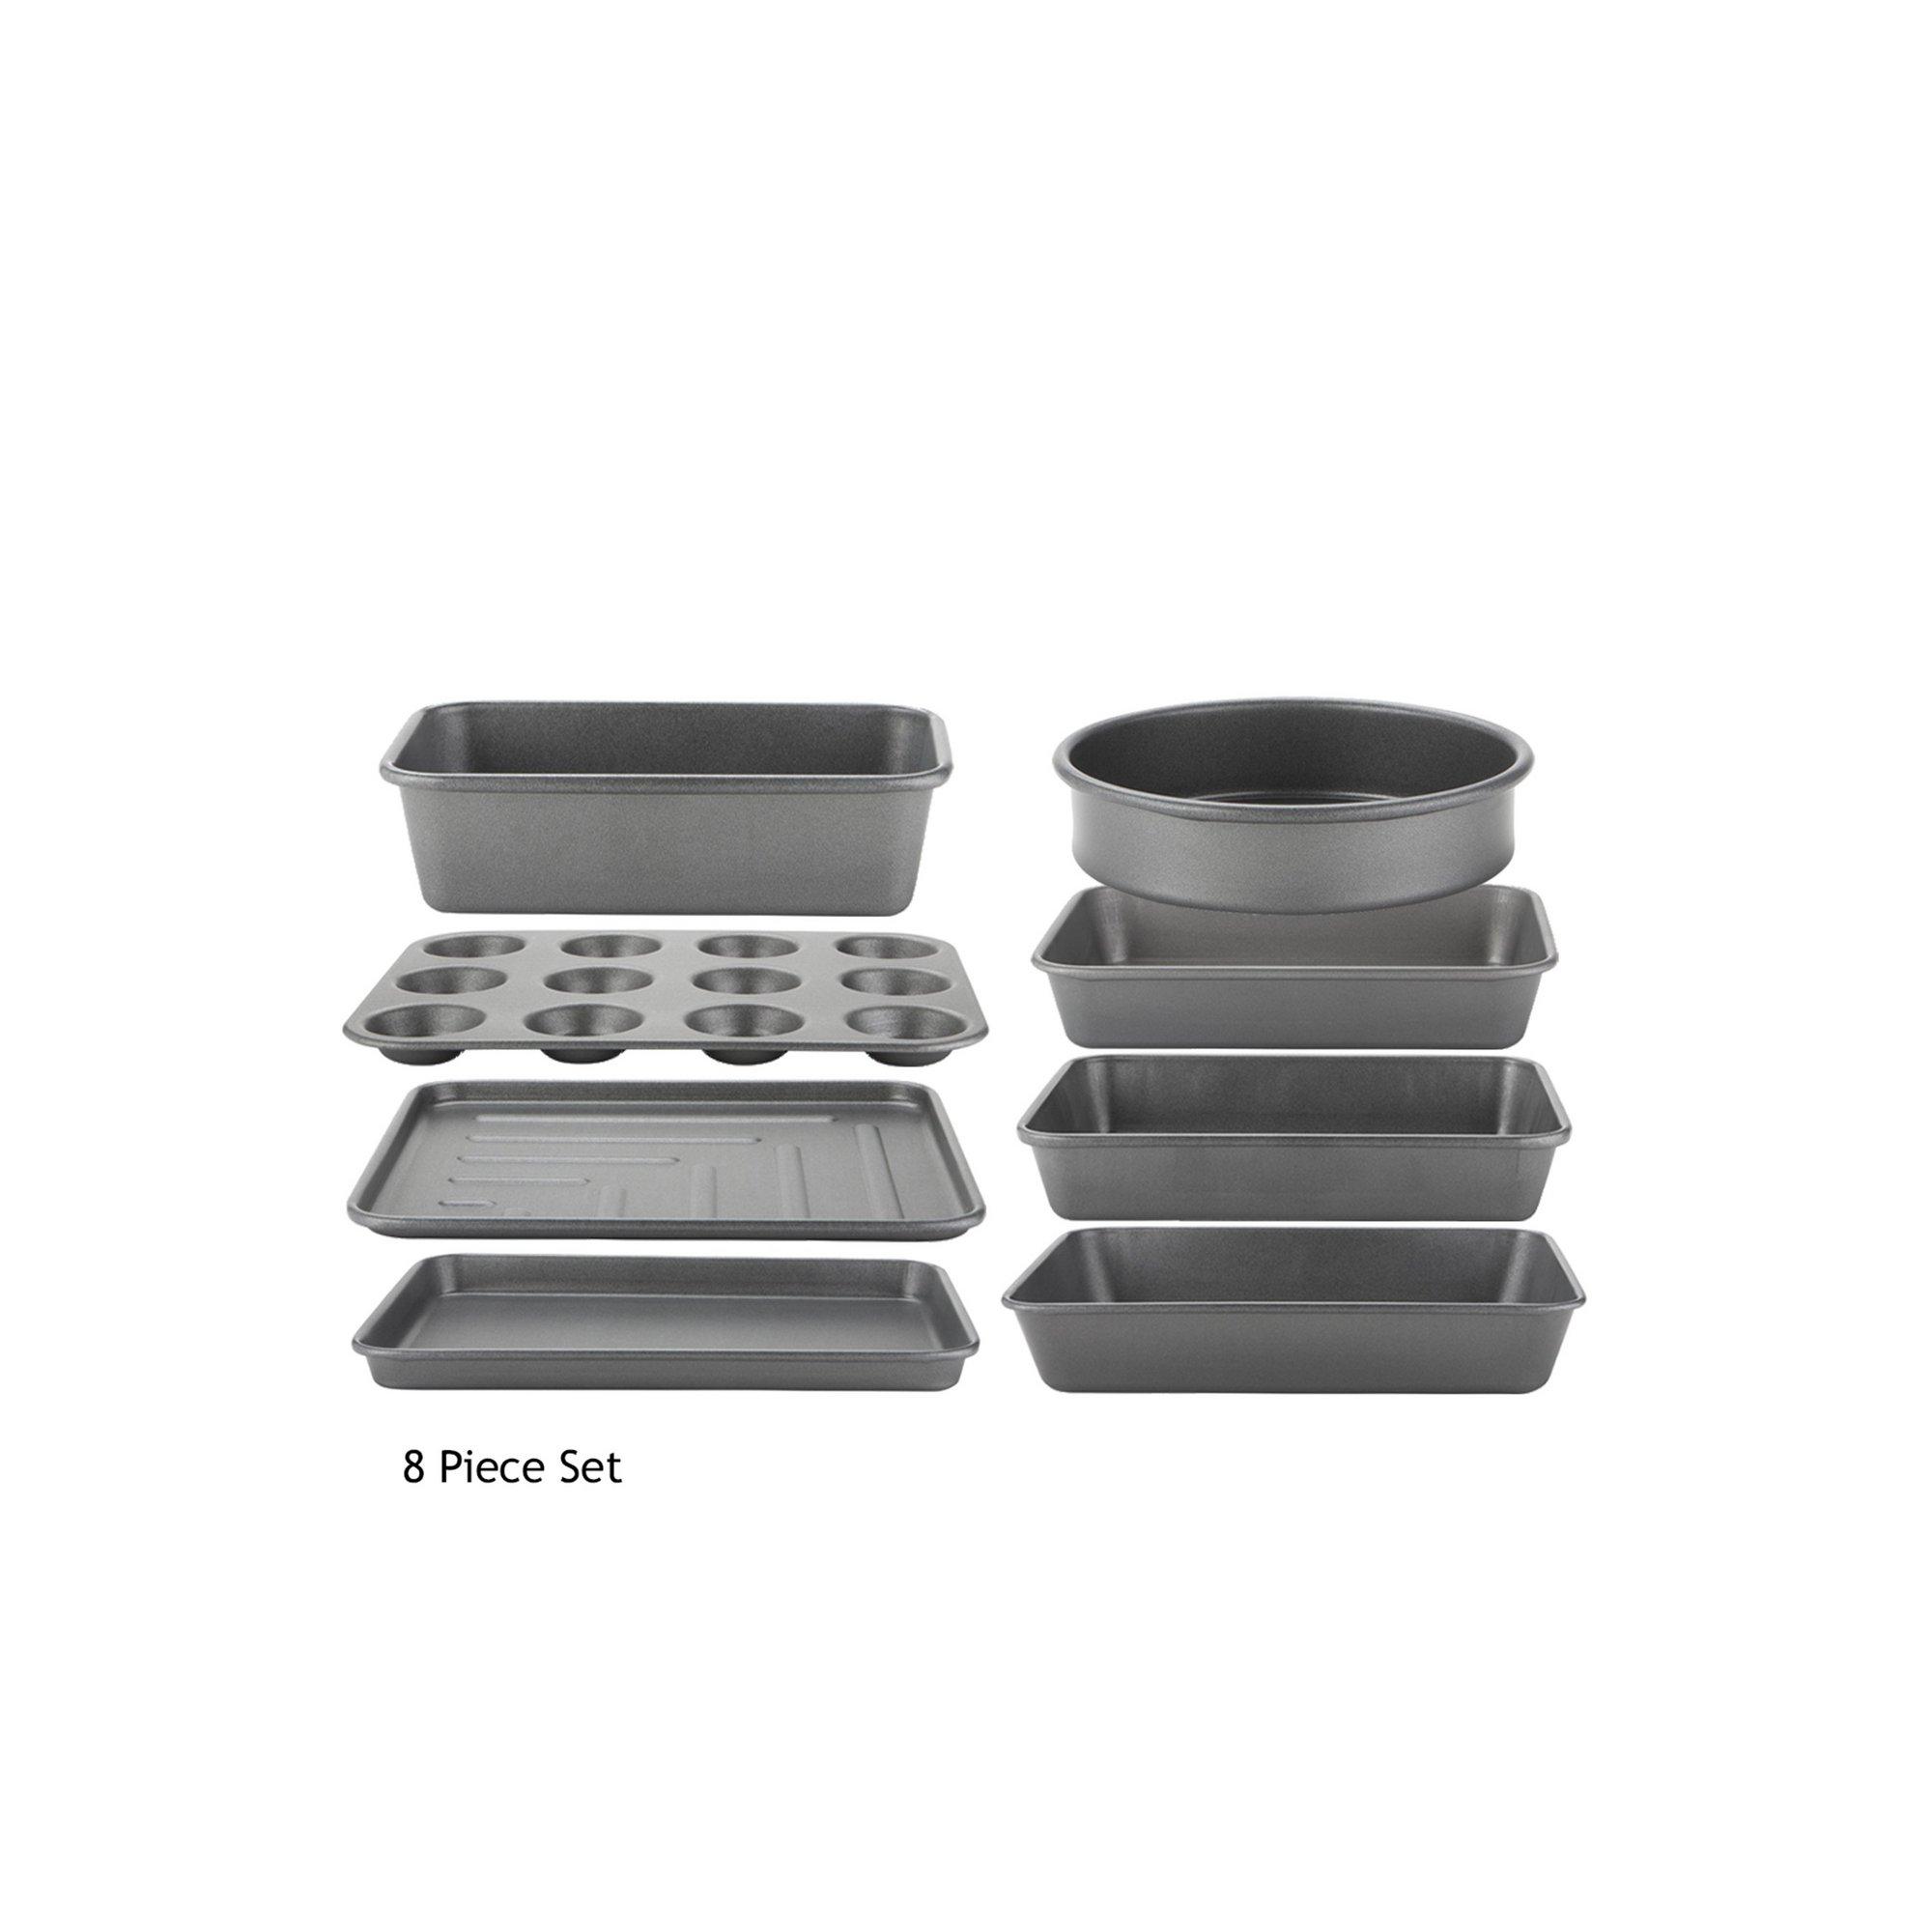 Image of Prestige 8 Piece Ovenware Set